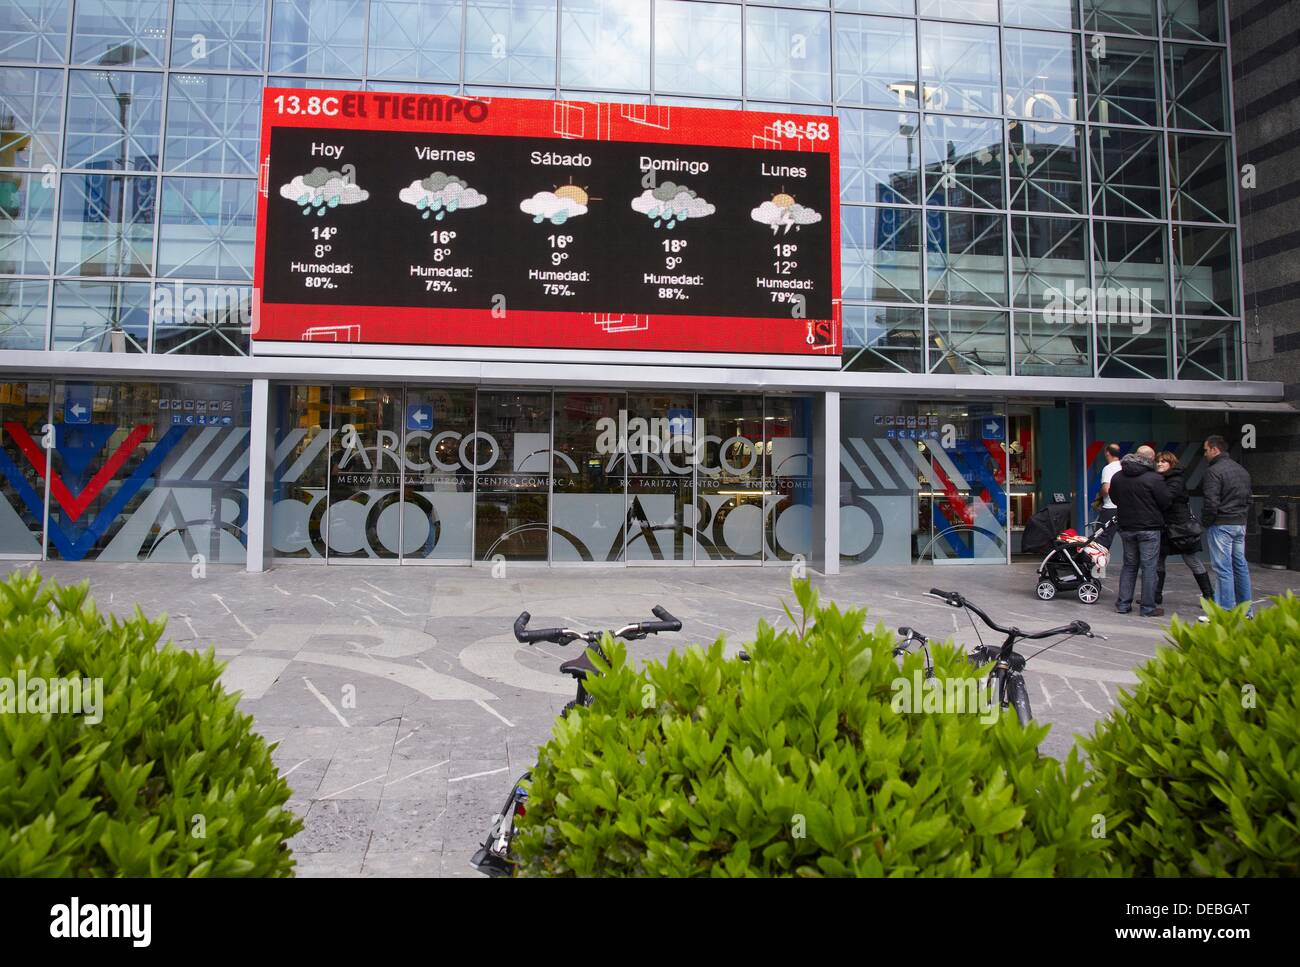 Giant LED TV screen, IPTV (Internet Protocol Television), shopping mall, San Sebastian, Guipuzcoa, Basque Country, Stock Photo